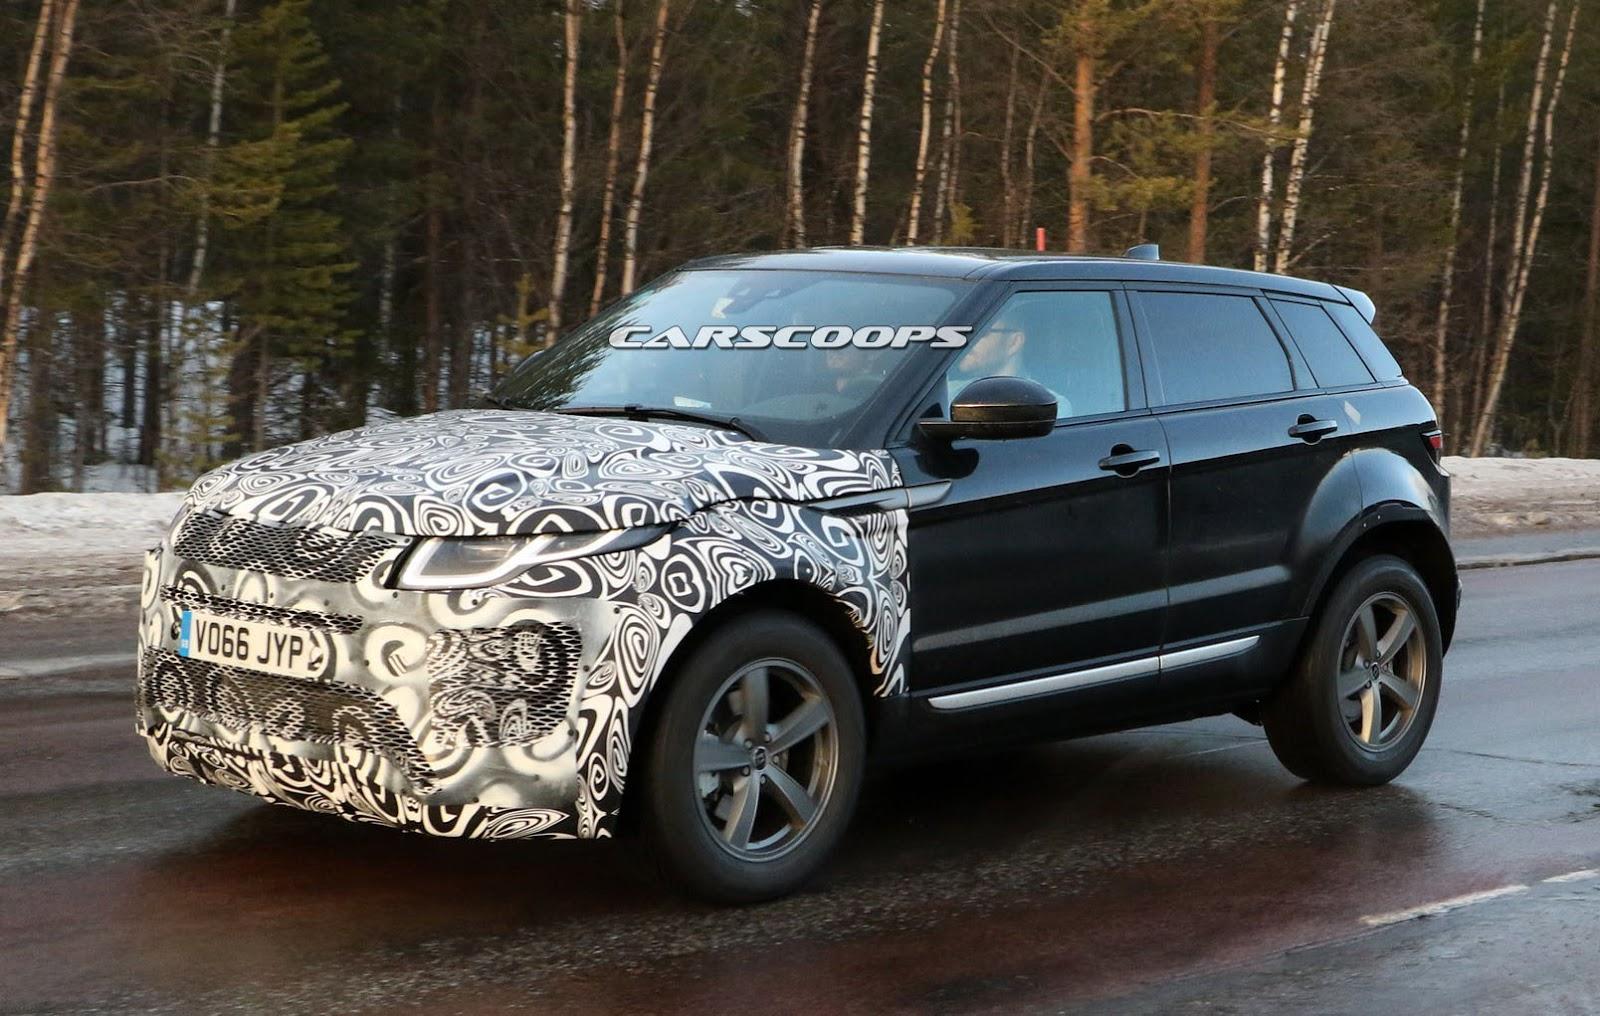 2019 Range Rover Evoque Will Basically Look Like A Smaller Velar